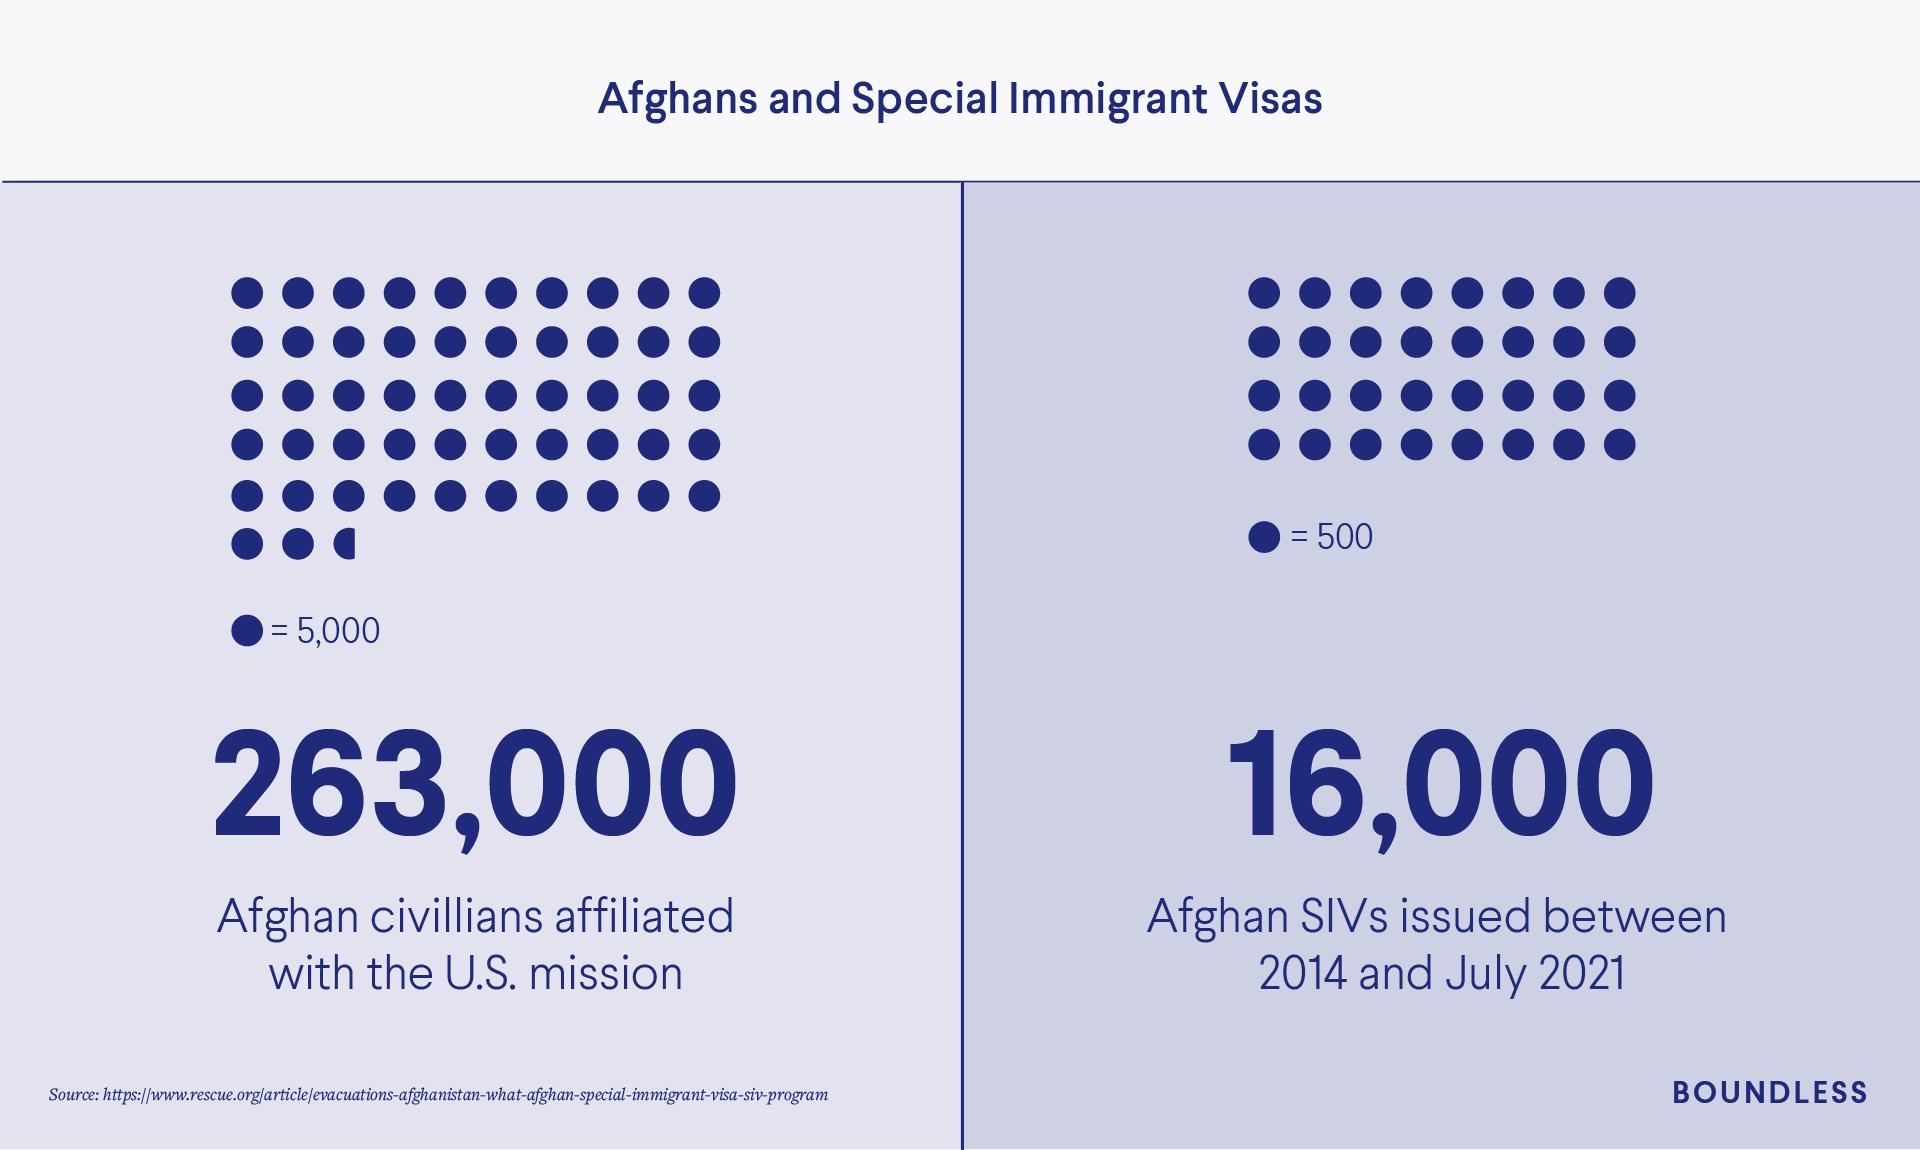 9/11 Afghan Special Immigrant Visas